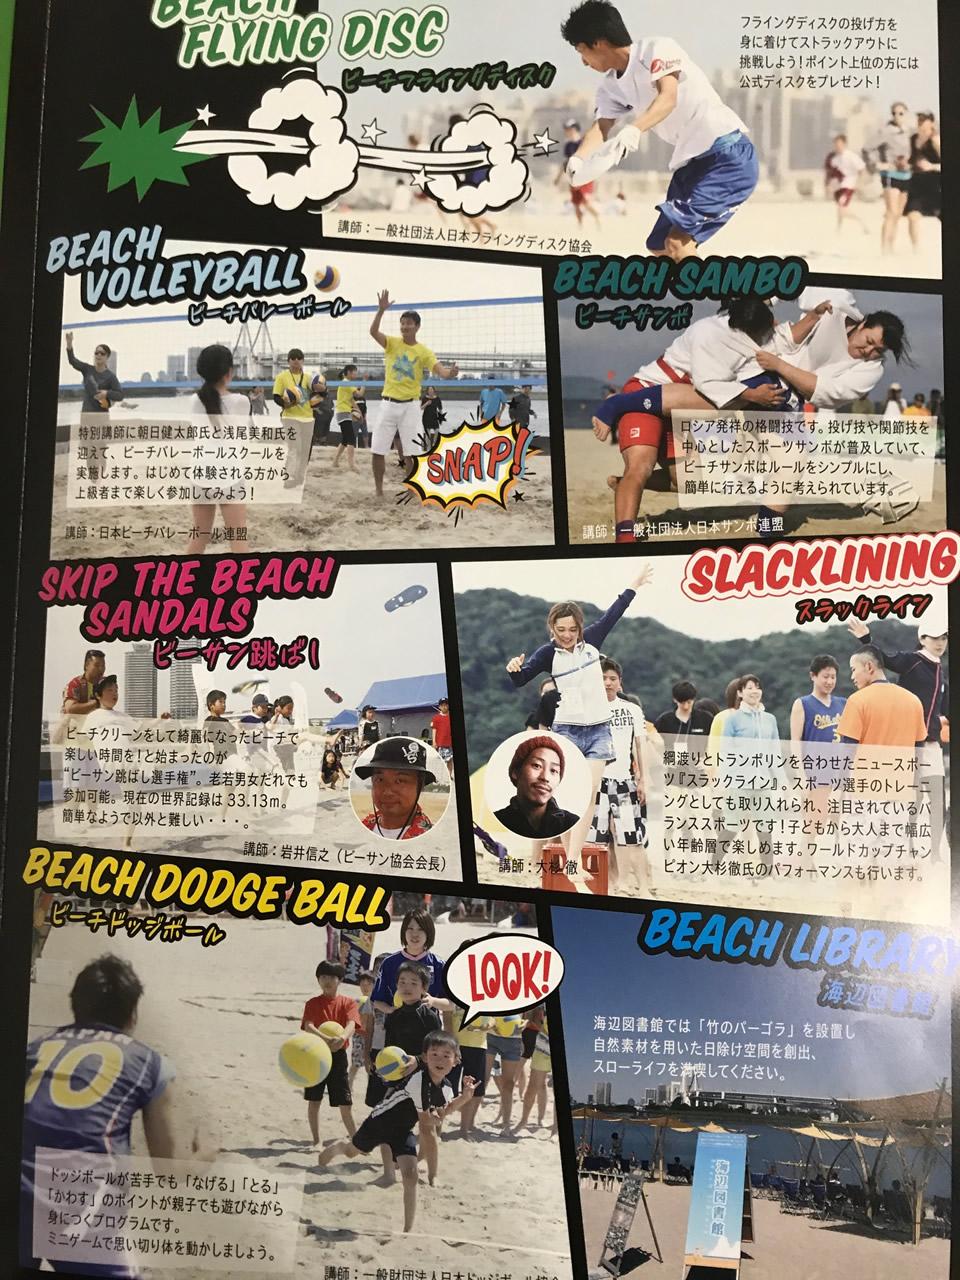 JAPAN BEACH GAME FESTIVAL 2017 体験プログラム 3